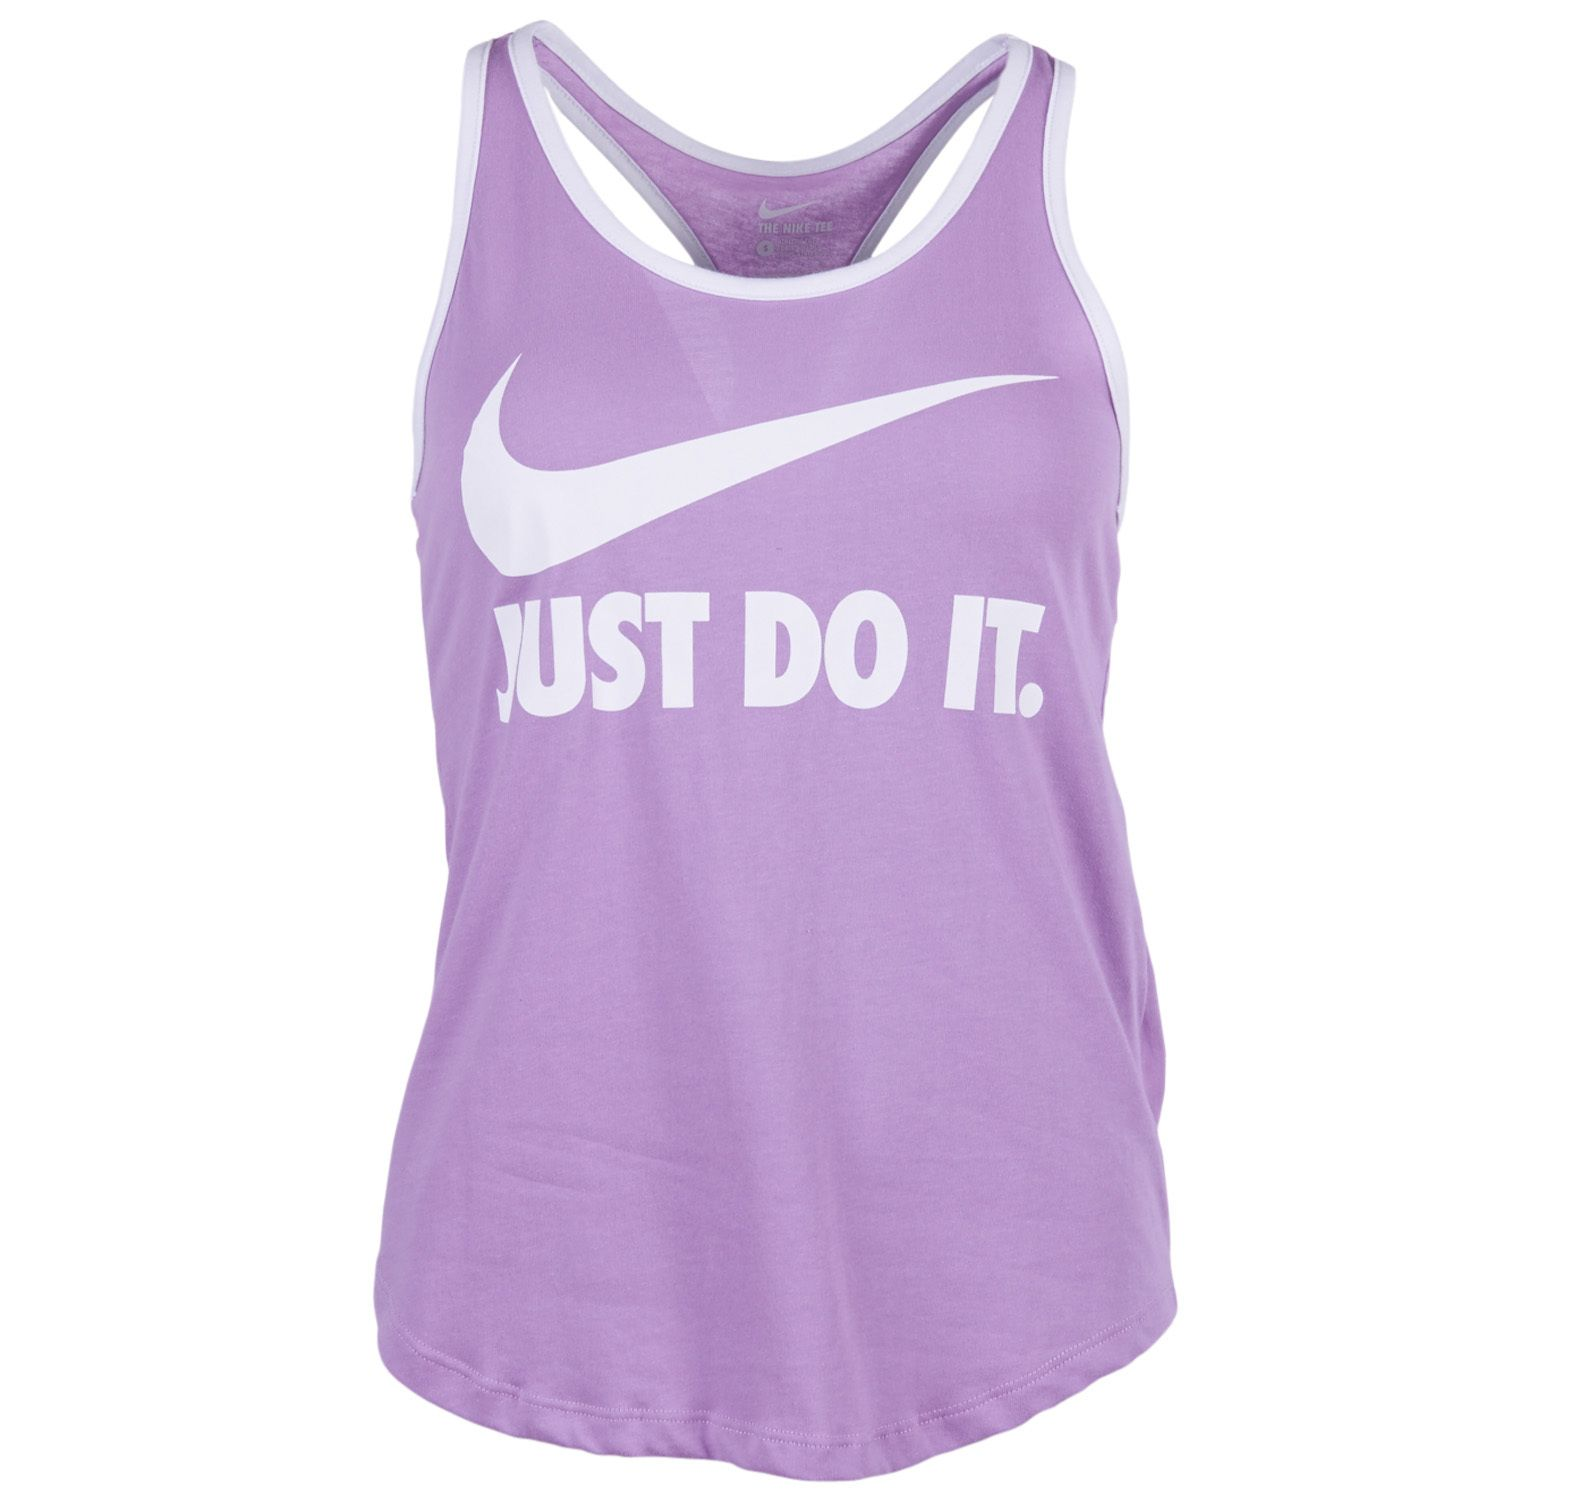 Swoosh Jdi Dfct Racer, Violet Shock/White/White, M,  Nike